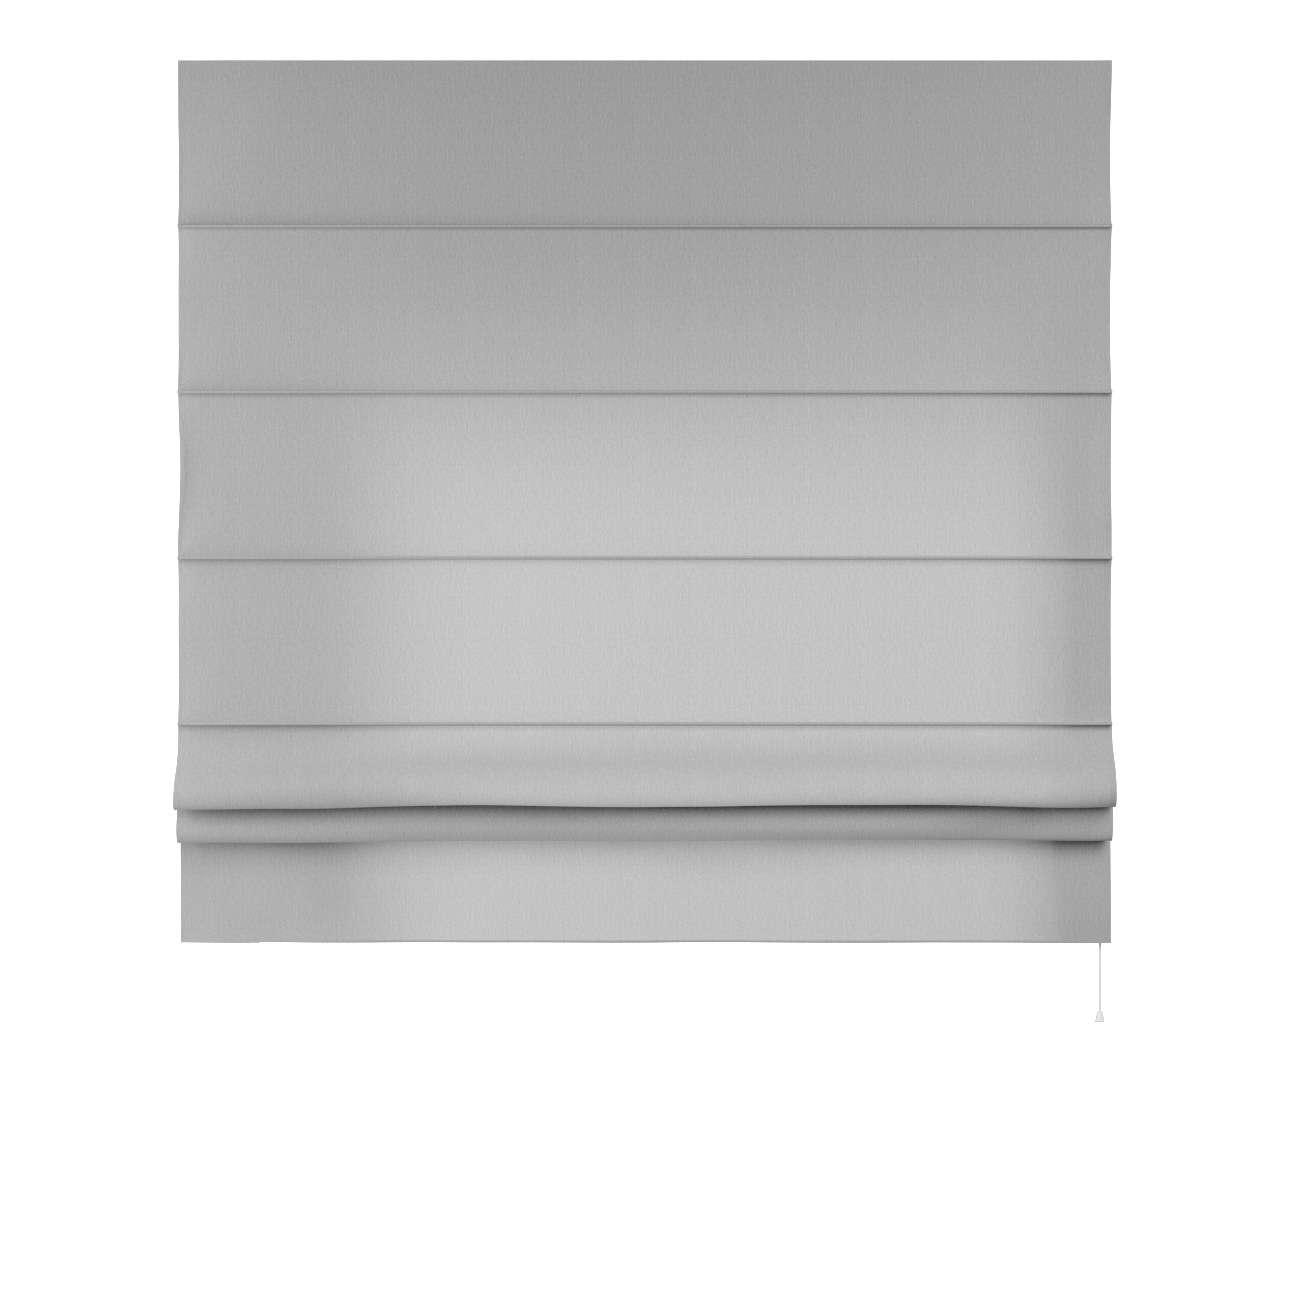 Padva roman blind  130 x 170 cm (51x 67 inch) in collection Chenille, fabric: 702-23